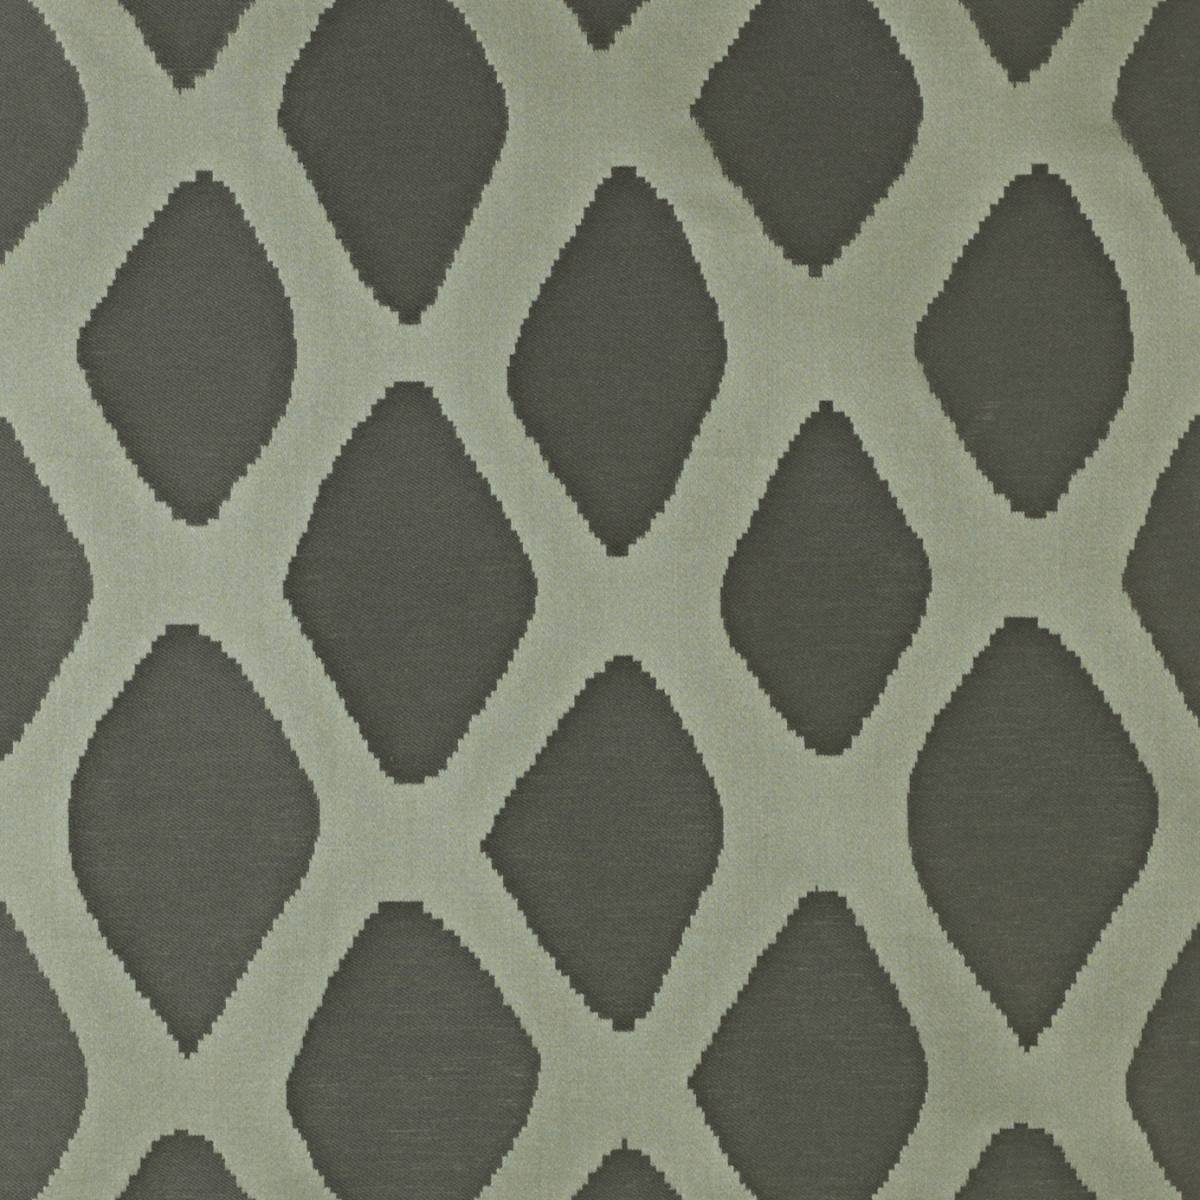 Luna fabric pewter 1729 908 prestigious textiles - Luna textil ...